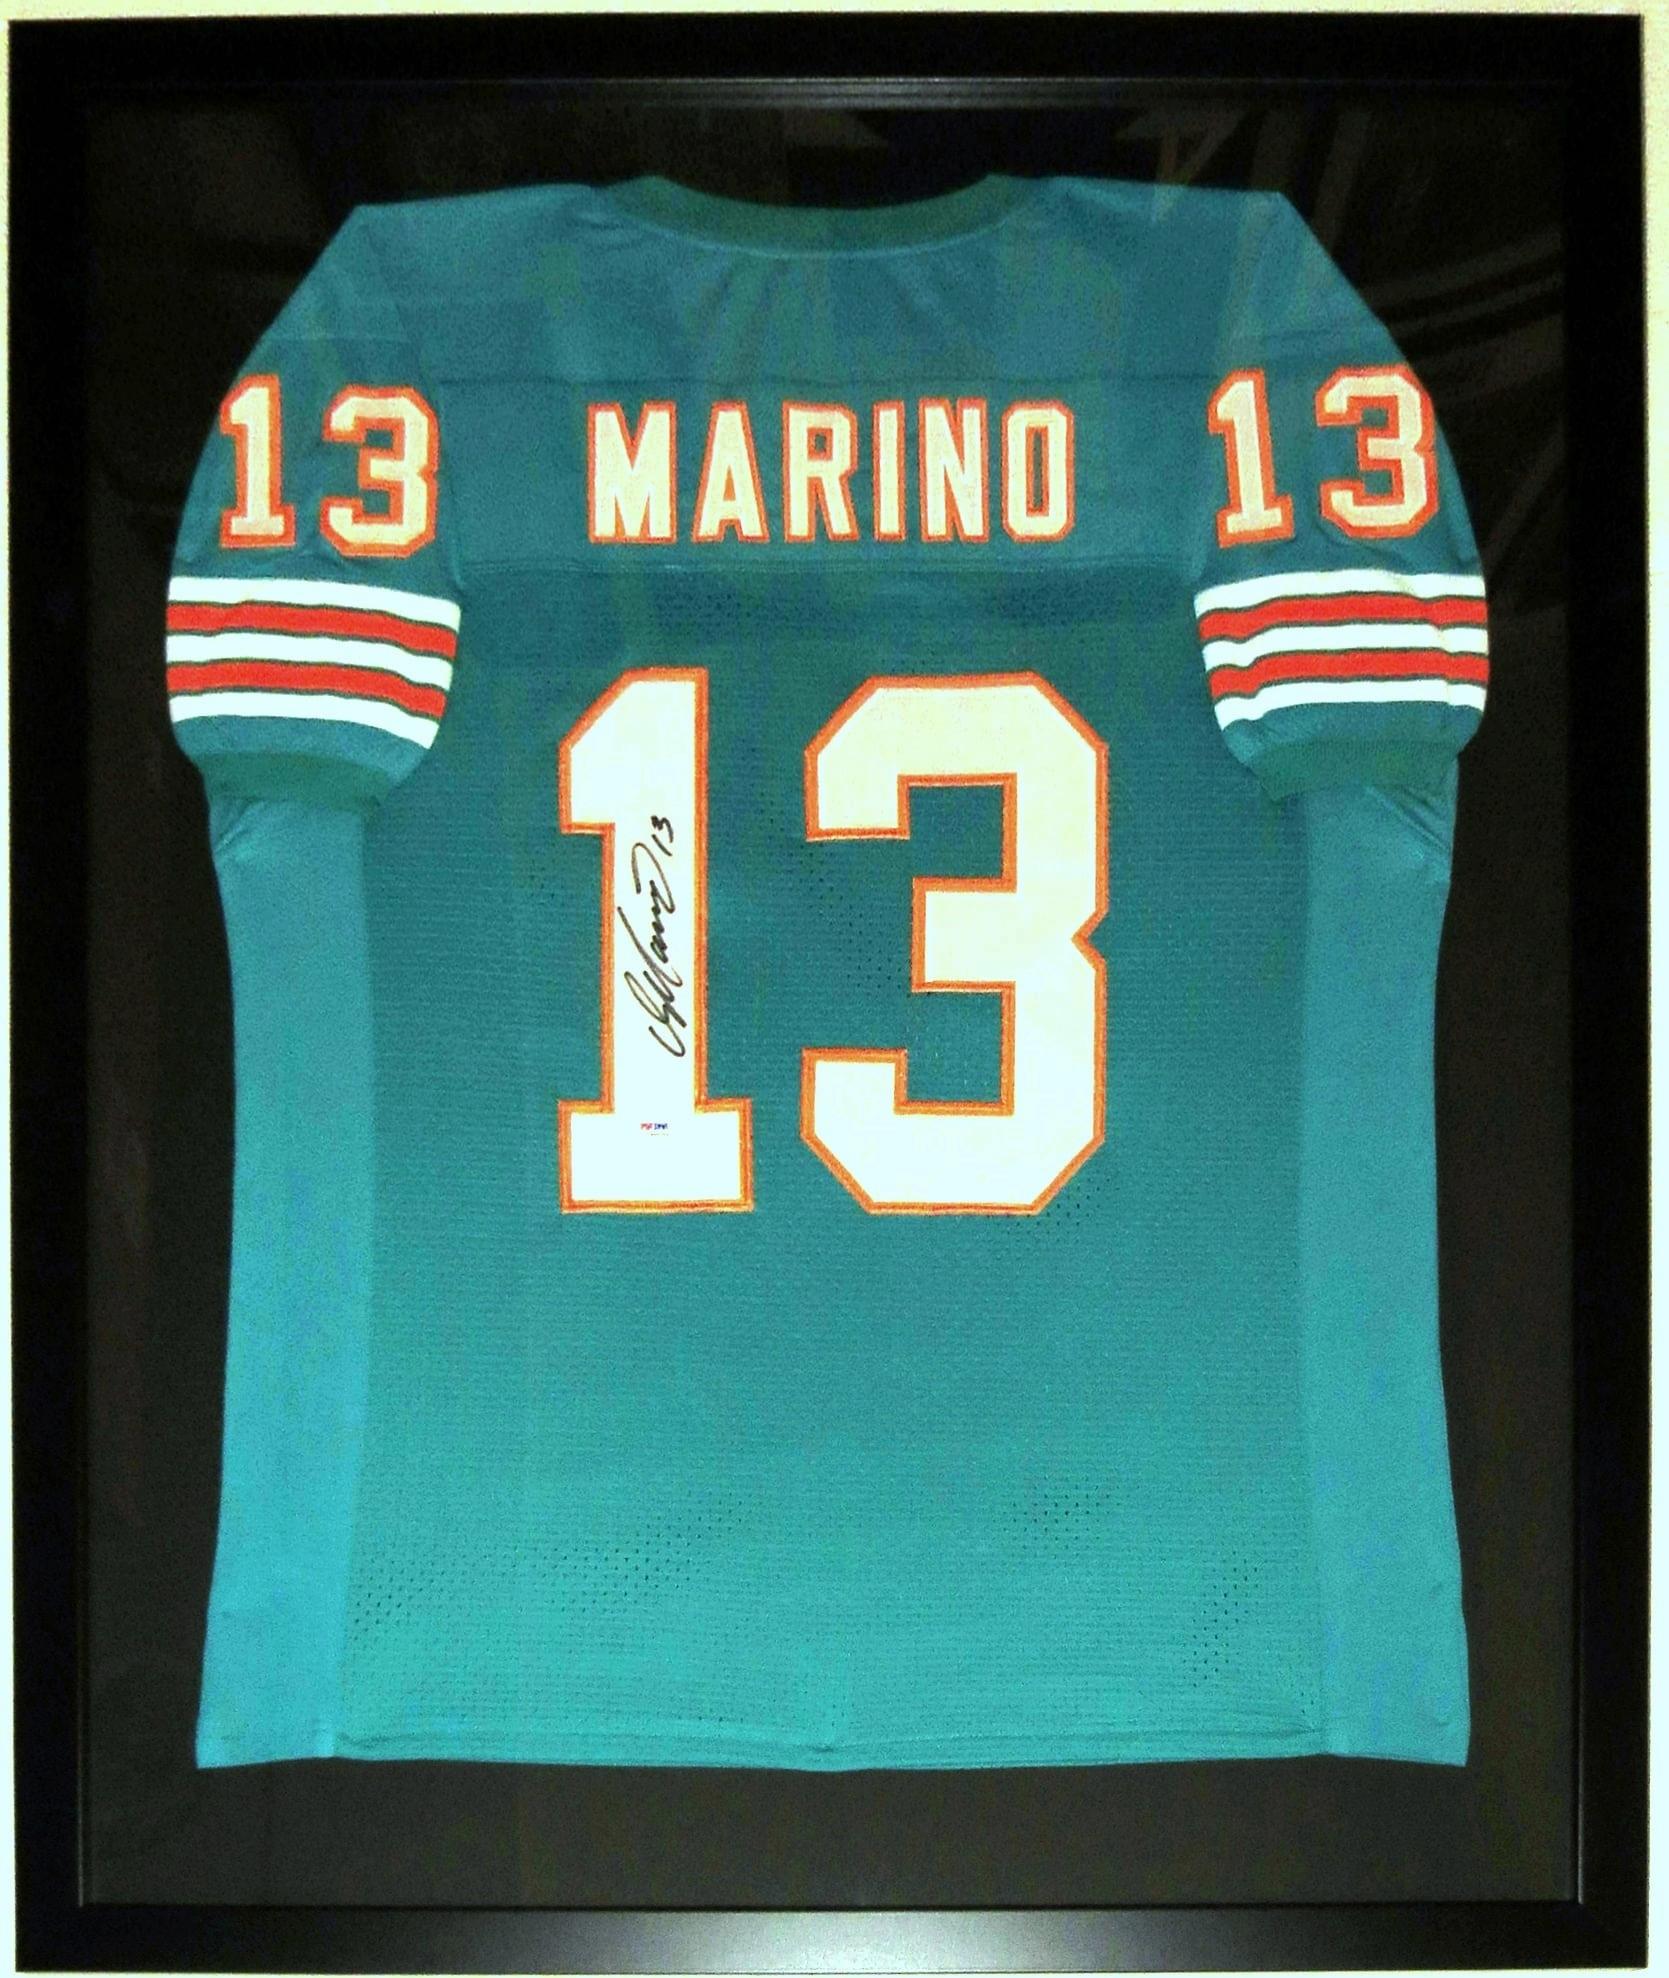 Dan Marino Signed Miami Dolphins Jersey - PSA DNA COA Authenticated - Professionally Framed 32x42